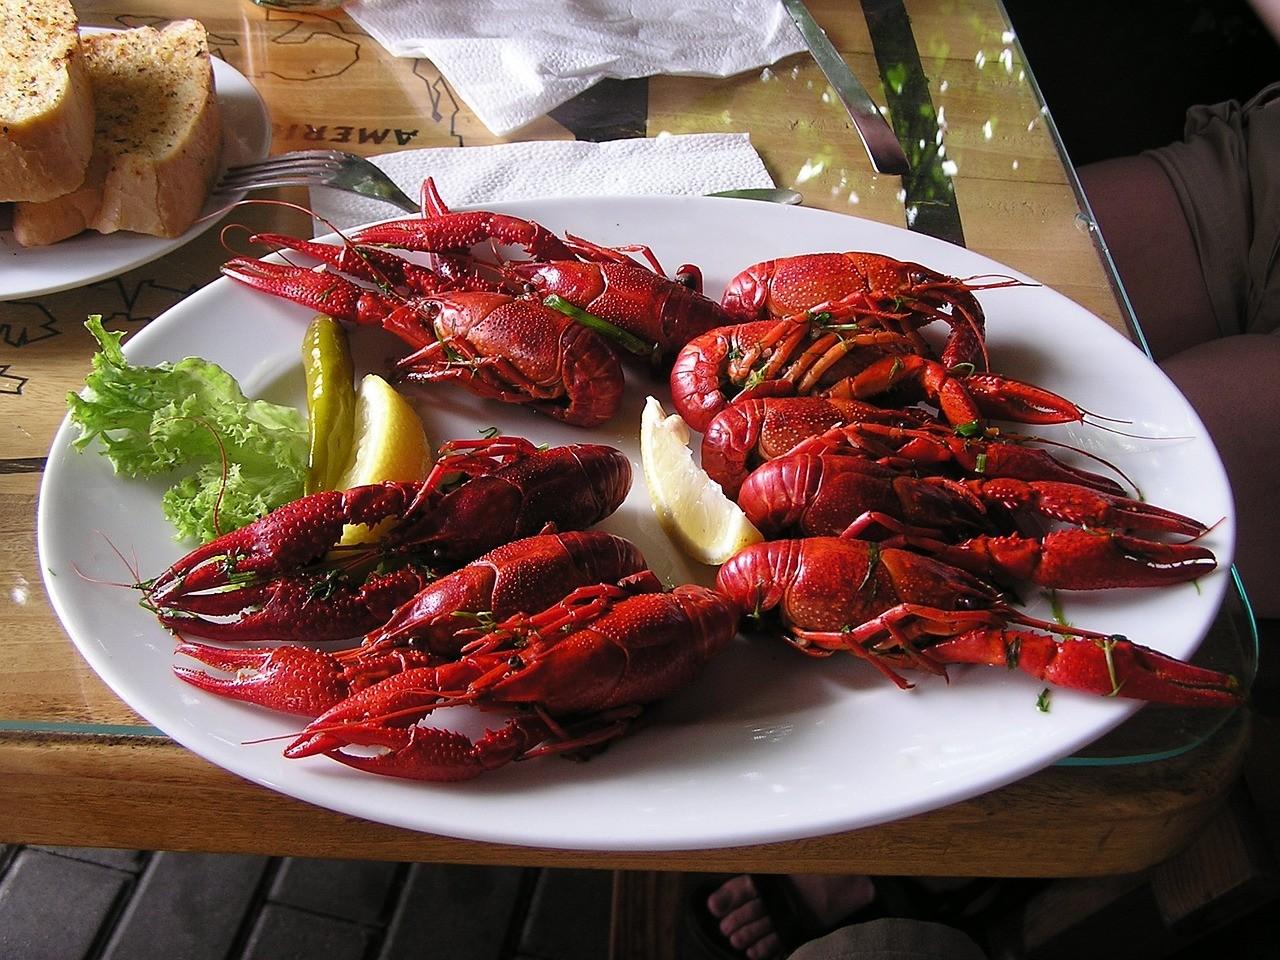 boiled-crayfish-749555_1280